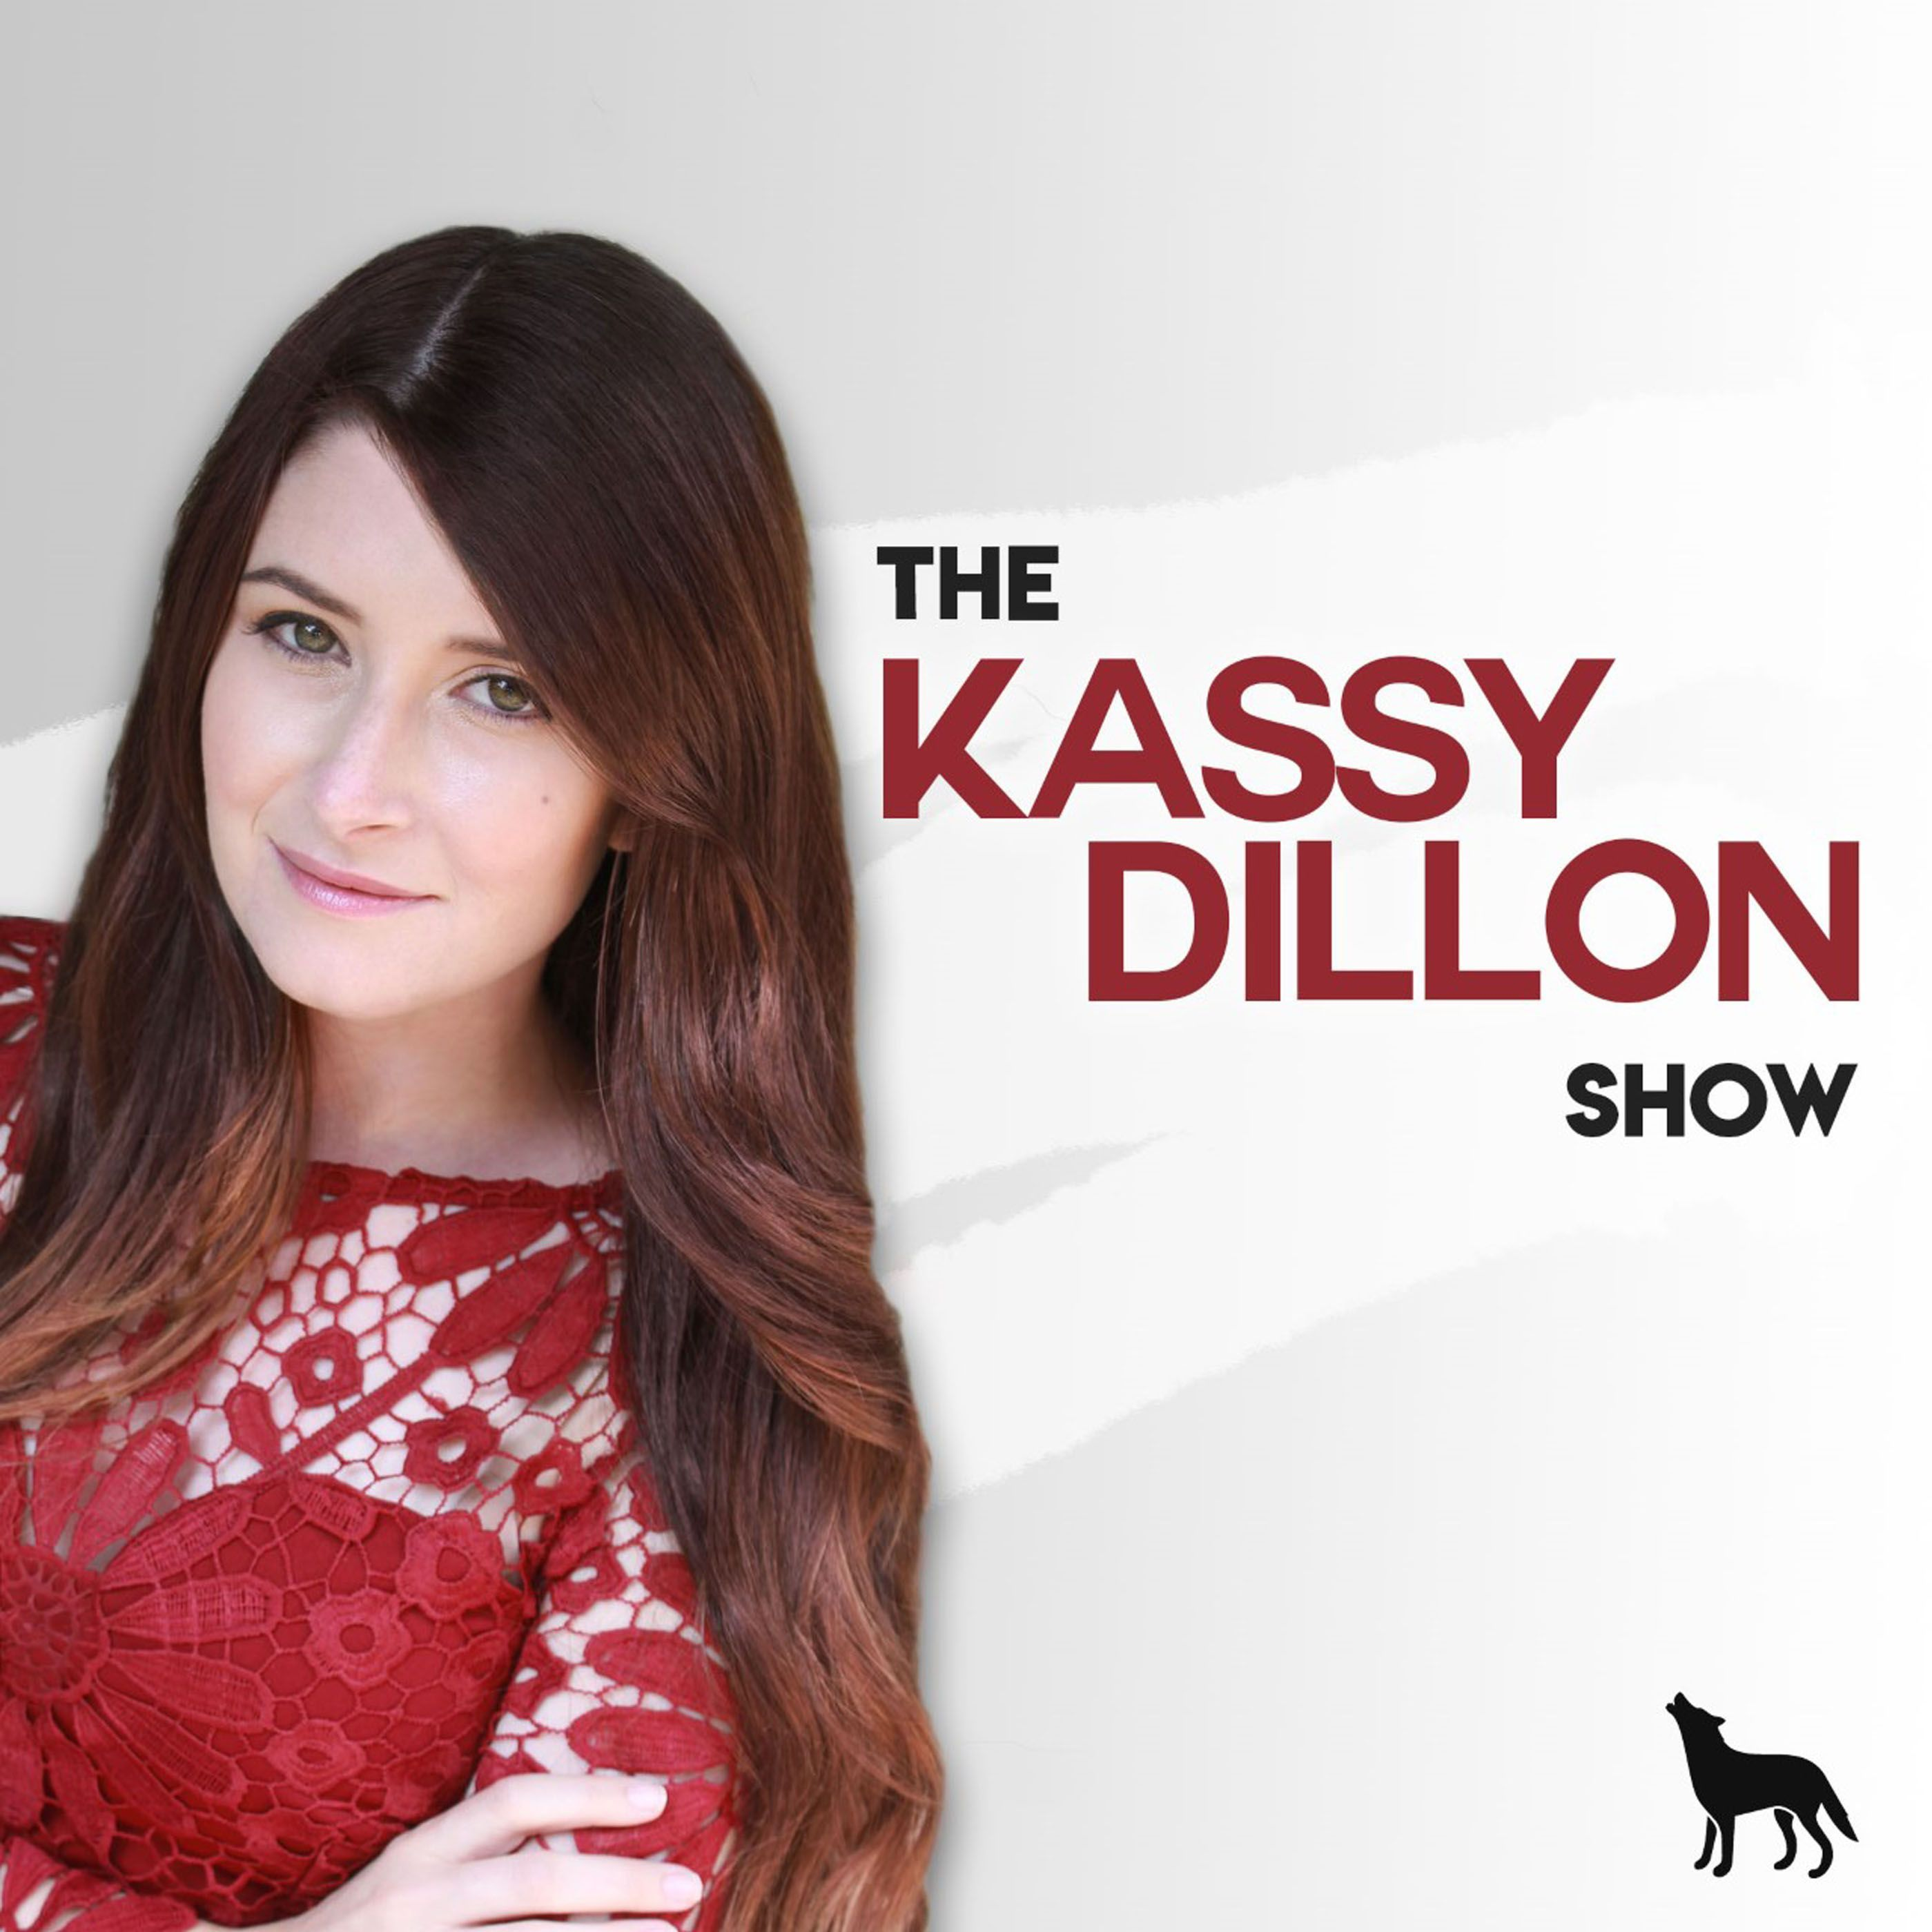 Kassy Dillon Show Teaser